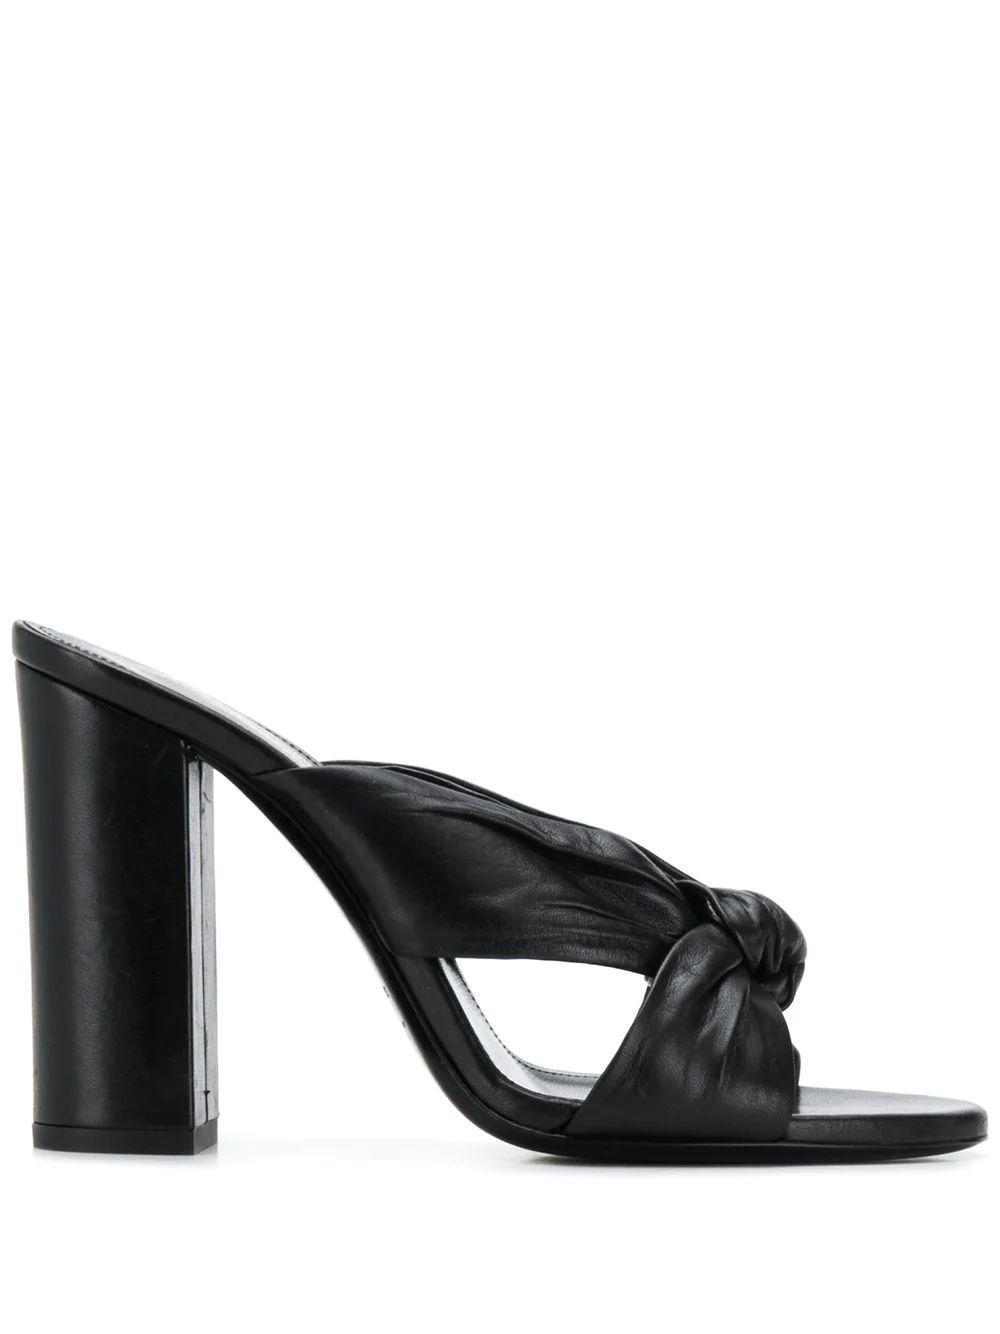 Loulou 100MM Block Heel Mule Sandal